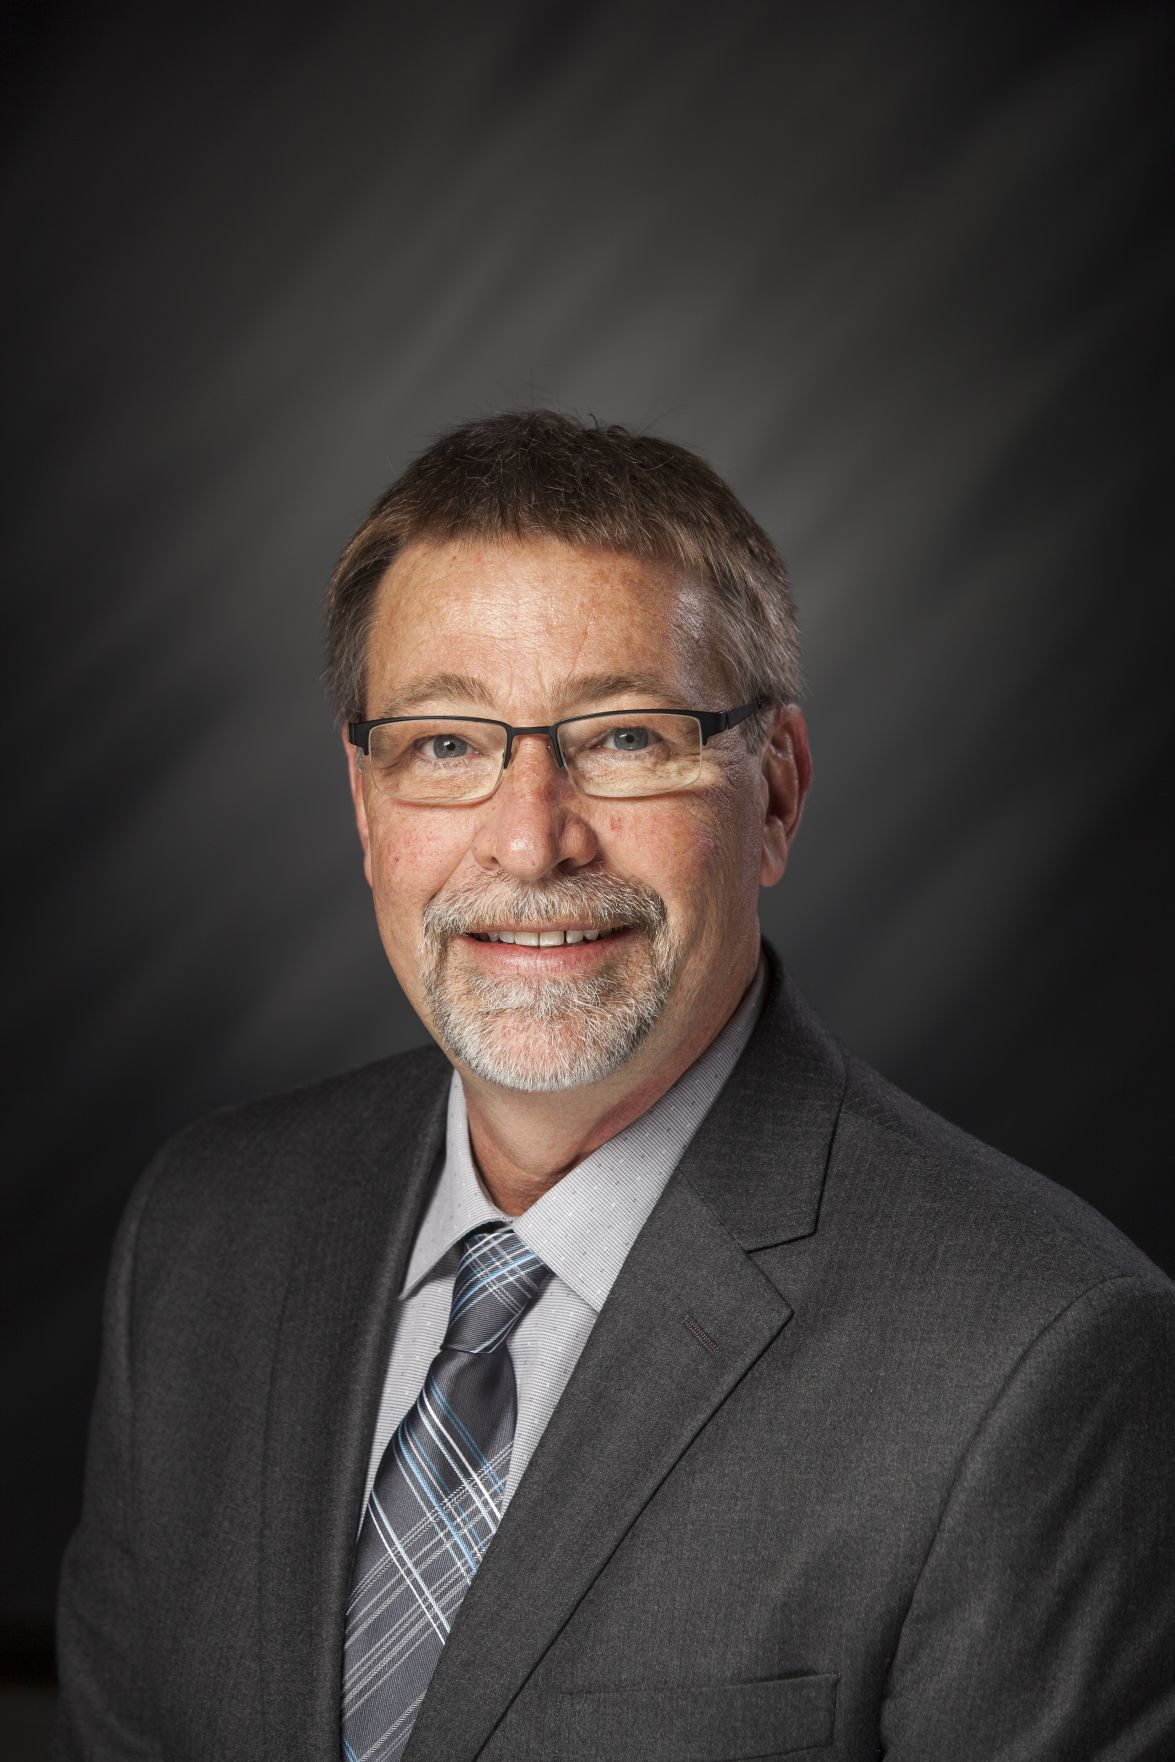 State Rep. Jim Pressel, R-Rolling Prairie